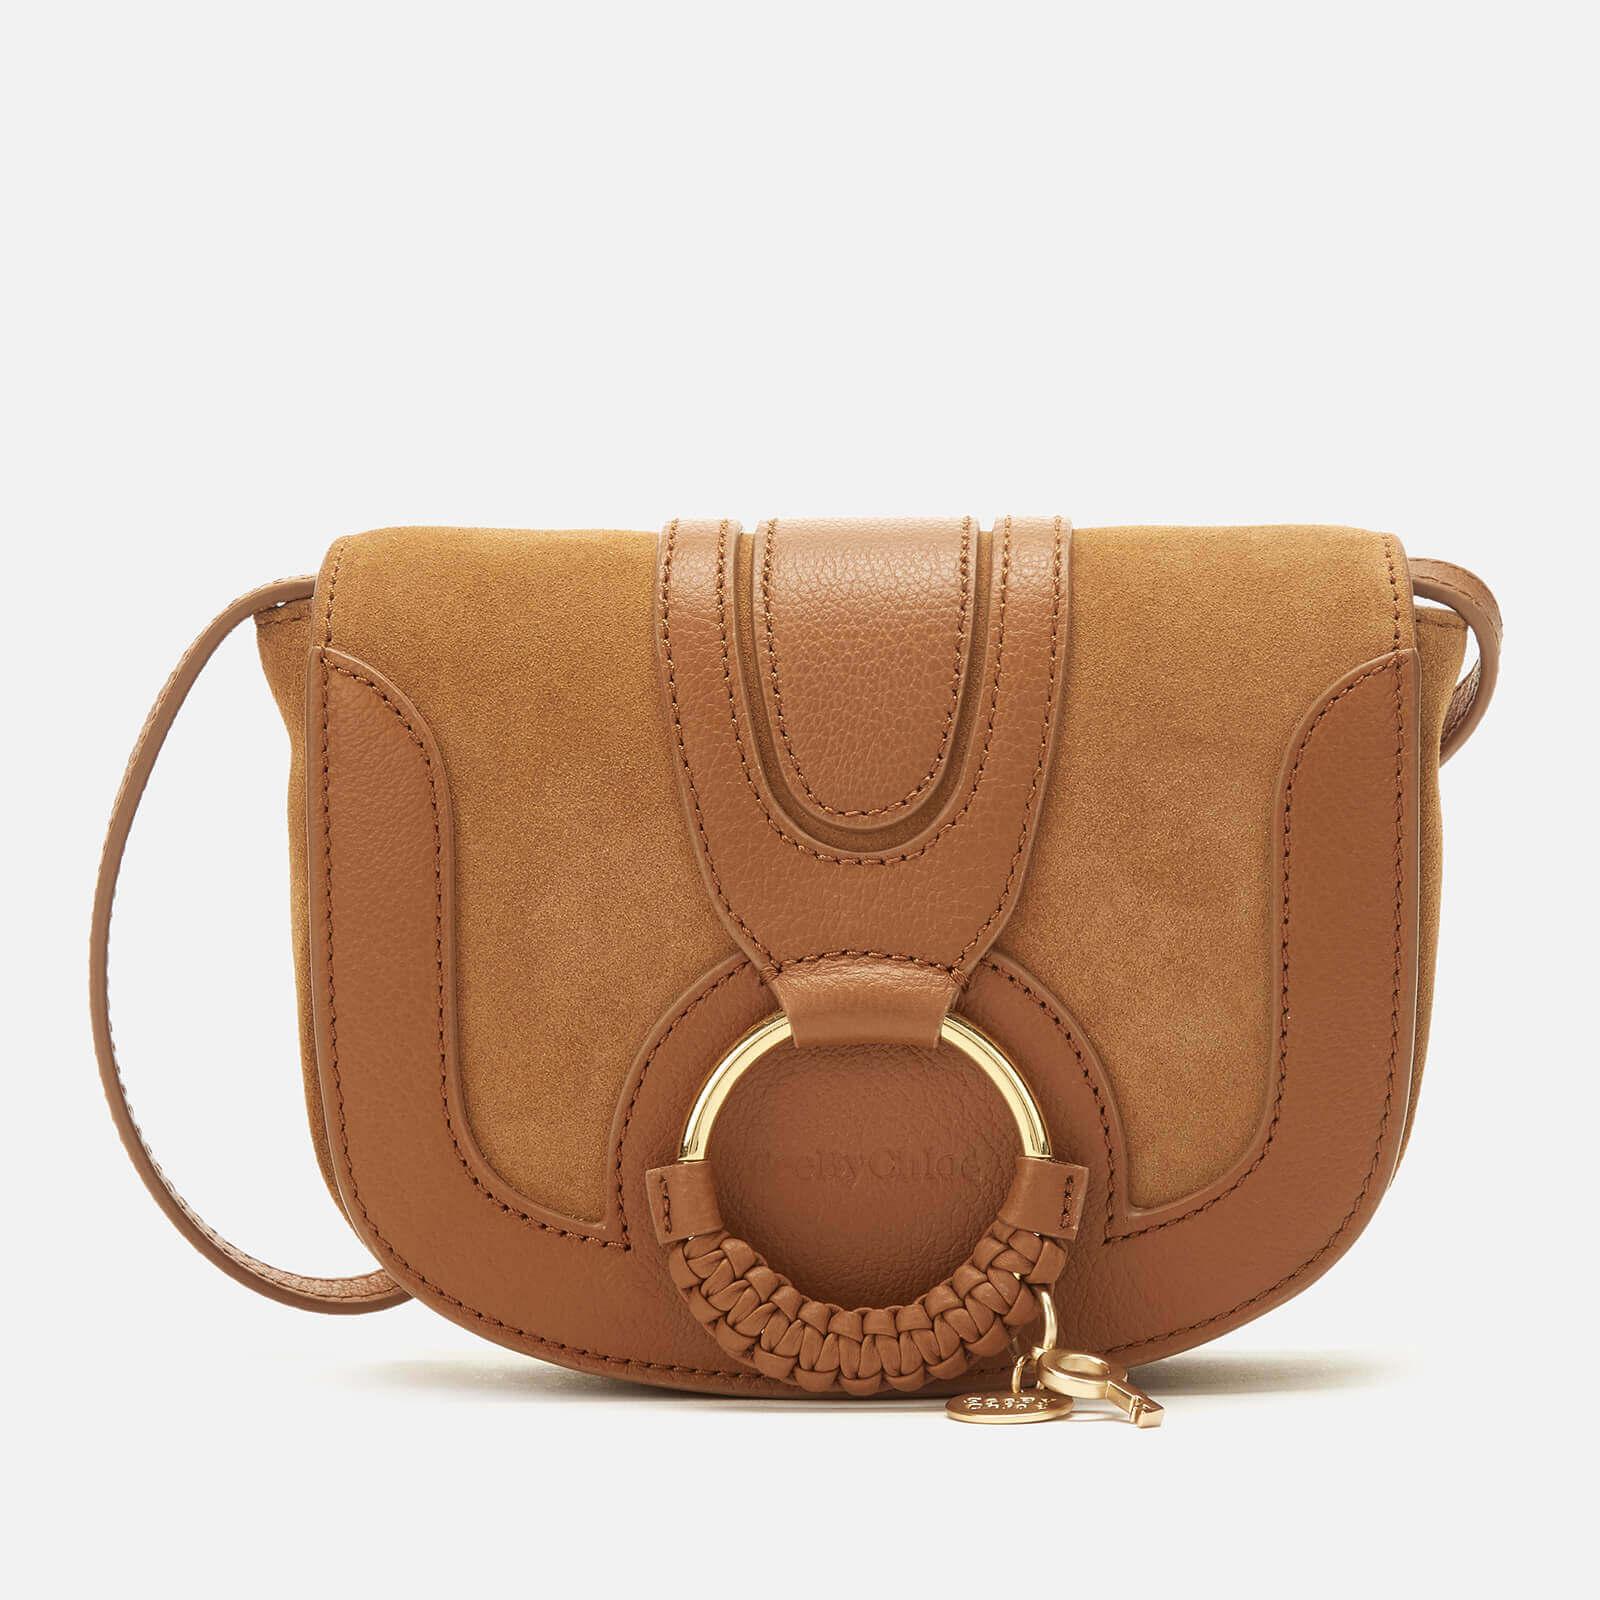 9cb1bdb2 See By Chloé Women's Small Hana Cross Body Bag - Caramelo